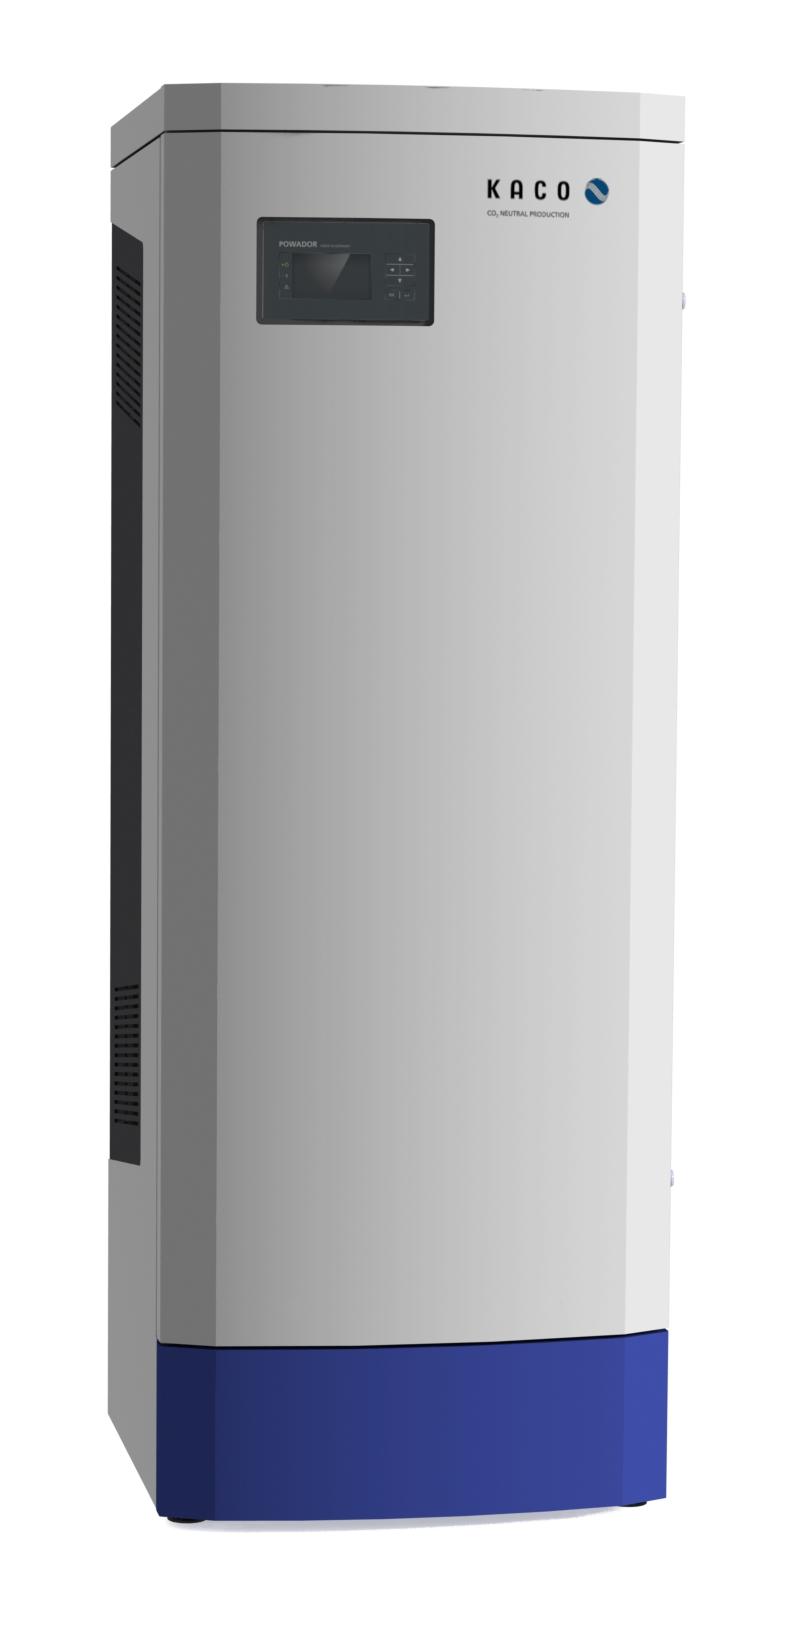 Powador-gridsave, das neue Energiespeichersystem von KACO new energy, Quelle: KACO - new energy